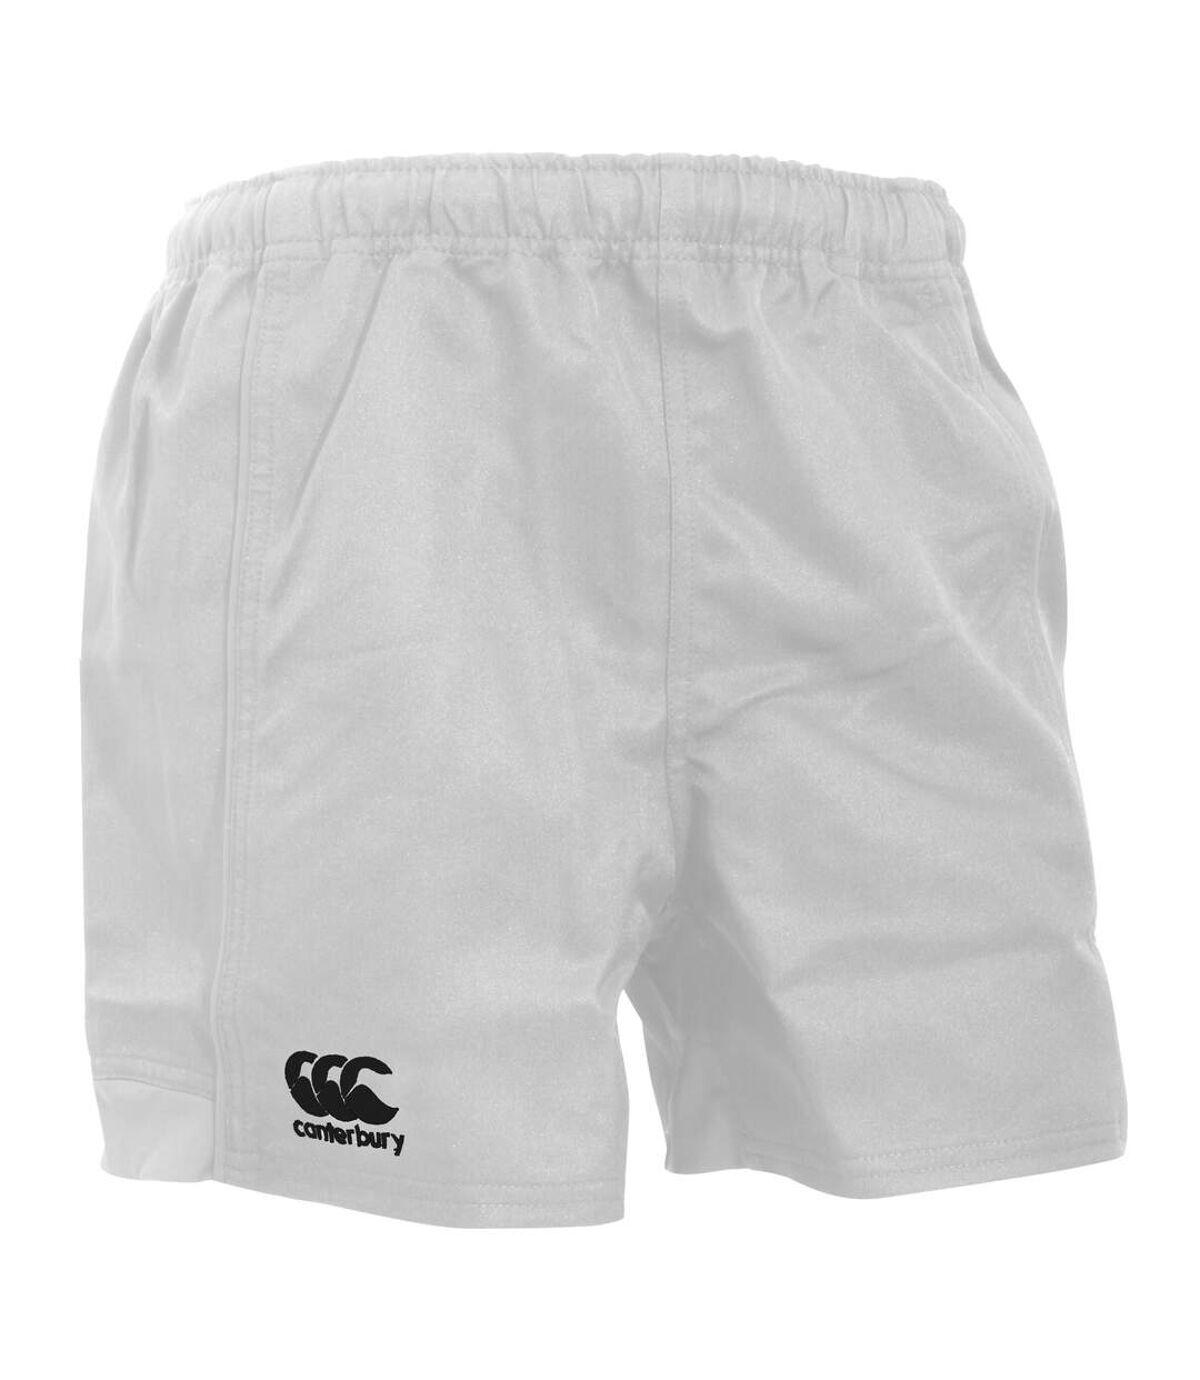 Canterbury Mens Advantage Elasticated Sports Shorts (White) - UTPC2494